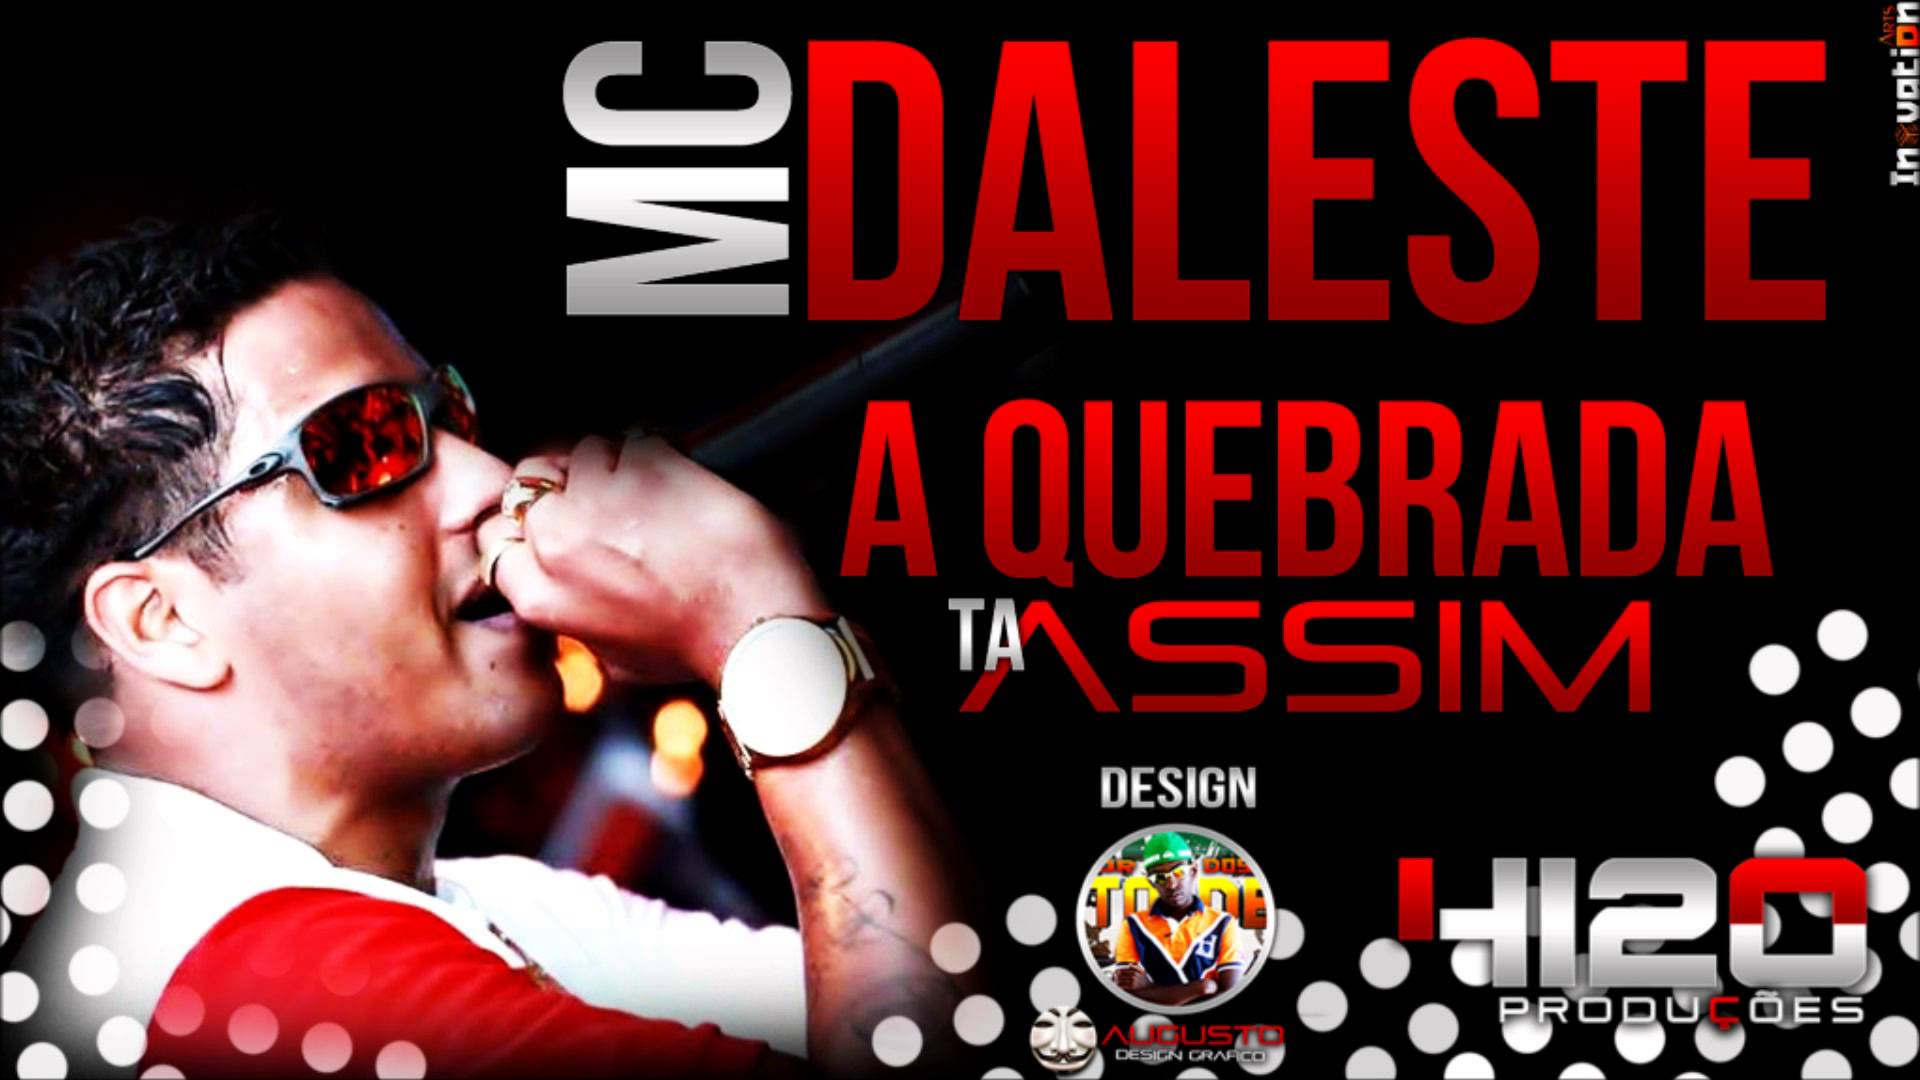 Mc Daleste Images - Mc Daleste Images